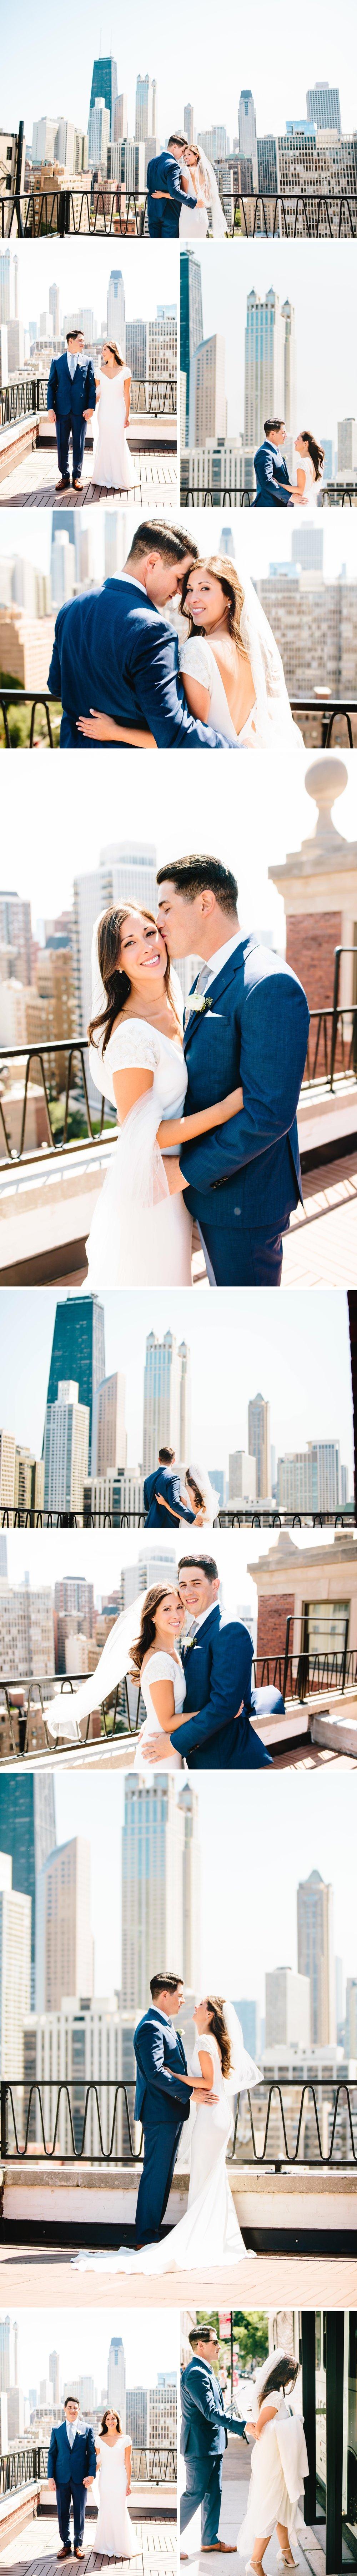 chicago-fine-art-wedding-photography-penninger5